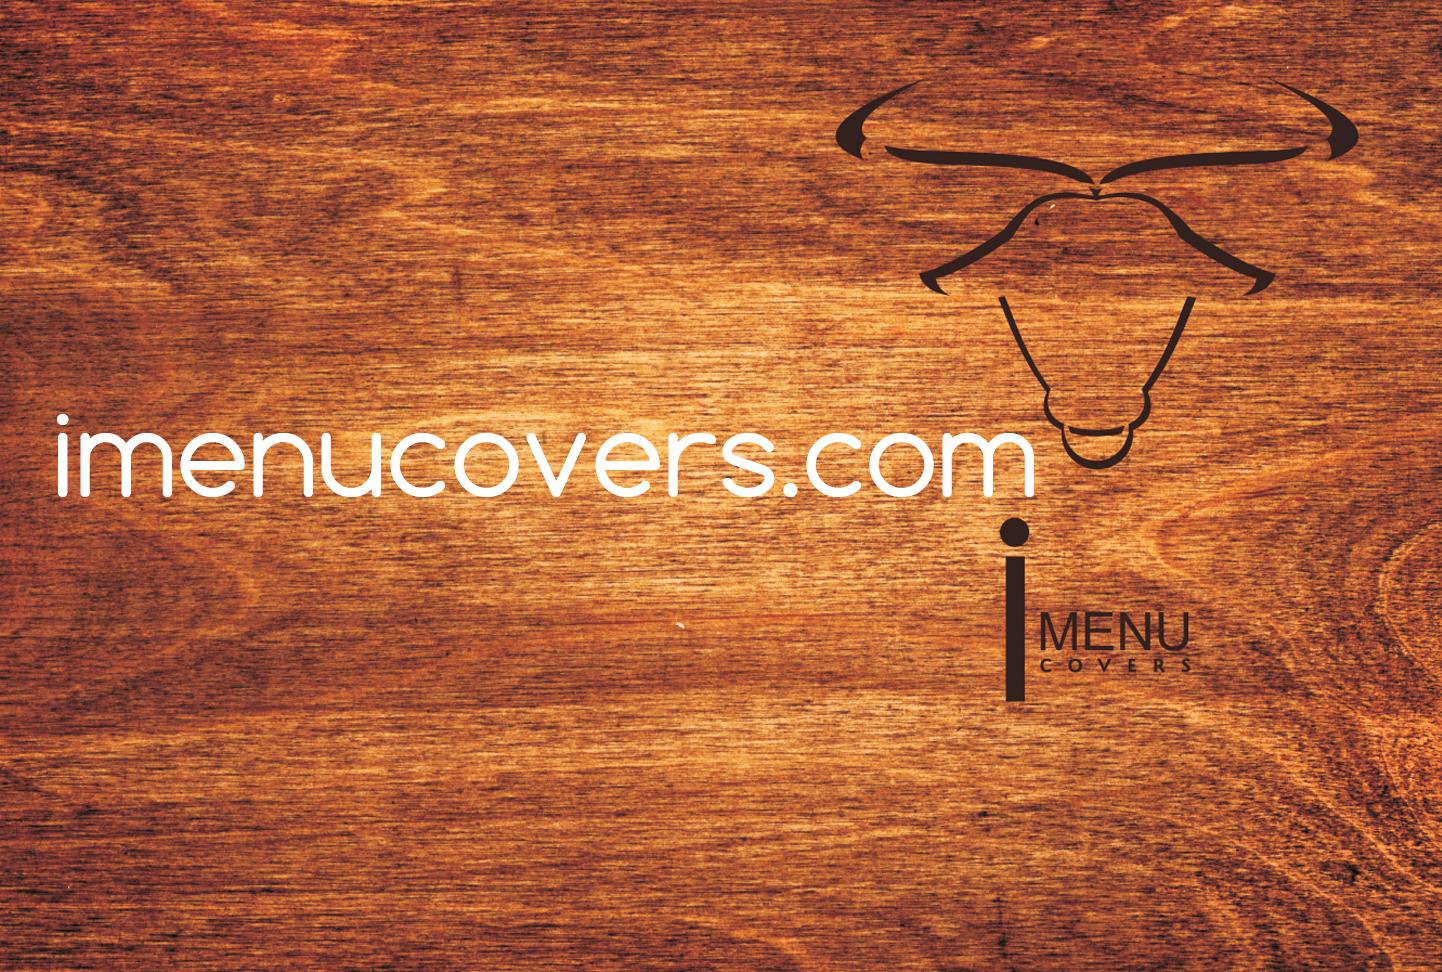 Steak House Menu Themes — IMenuCovers